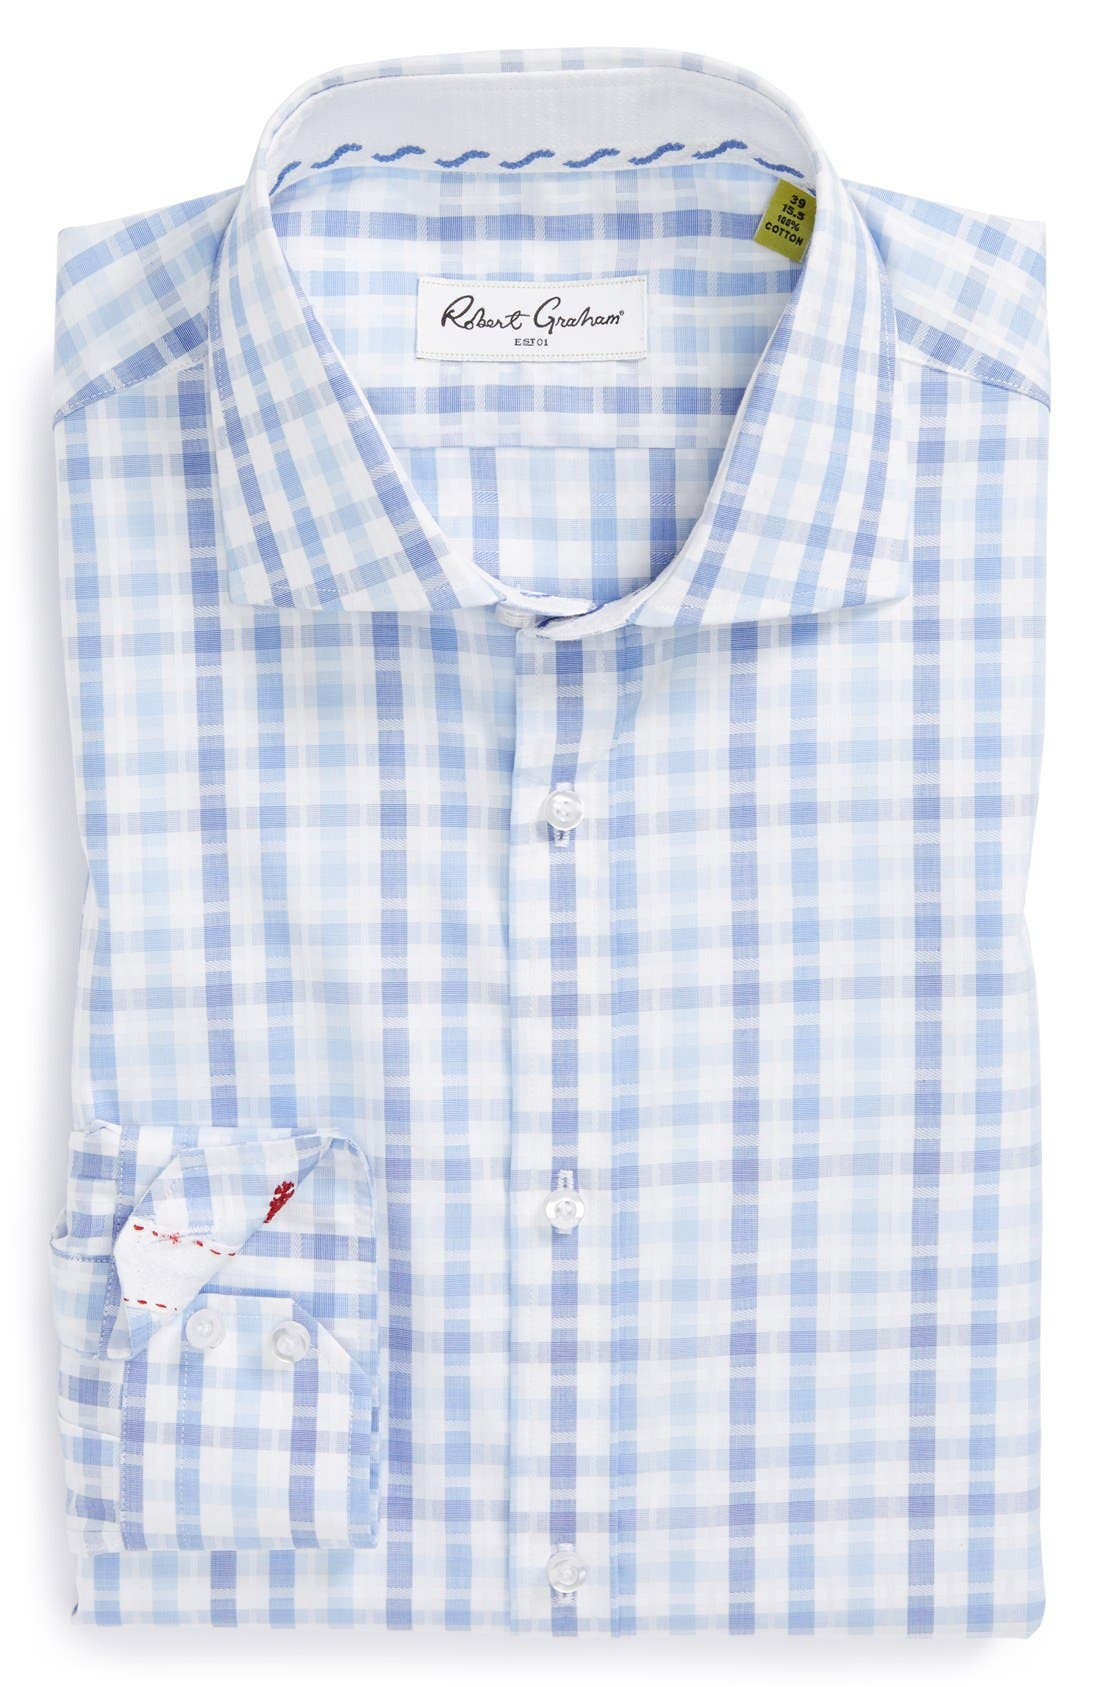 Alternate Image 1 Selected - Robert Graham 'Ethan' Regular Fit Check Dress Shirt